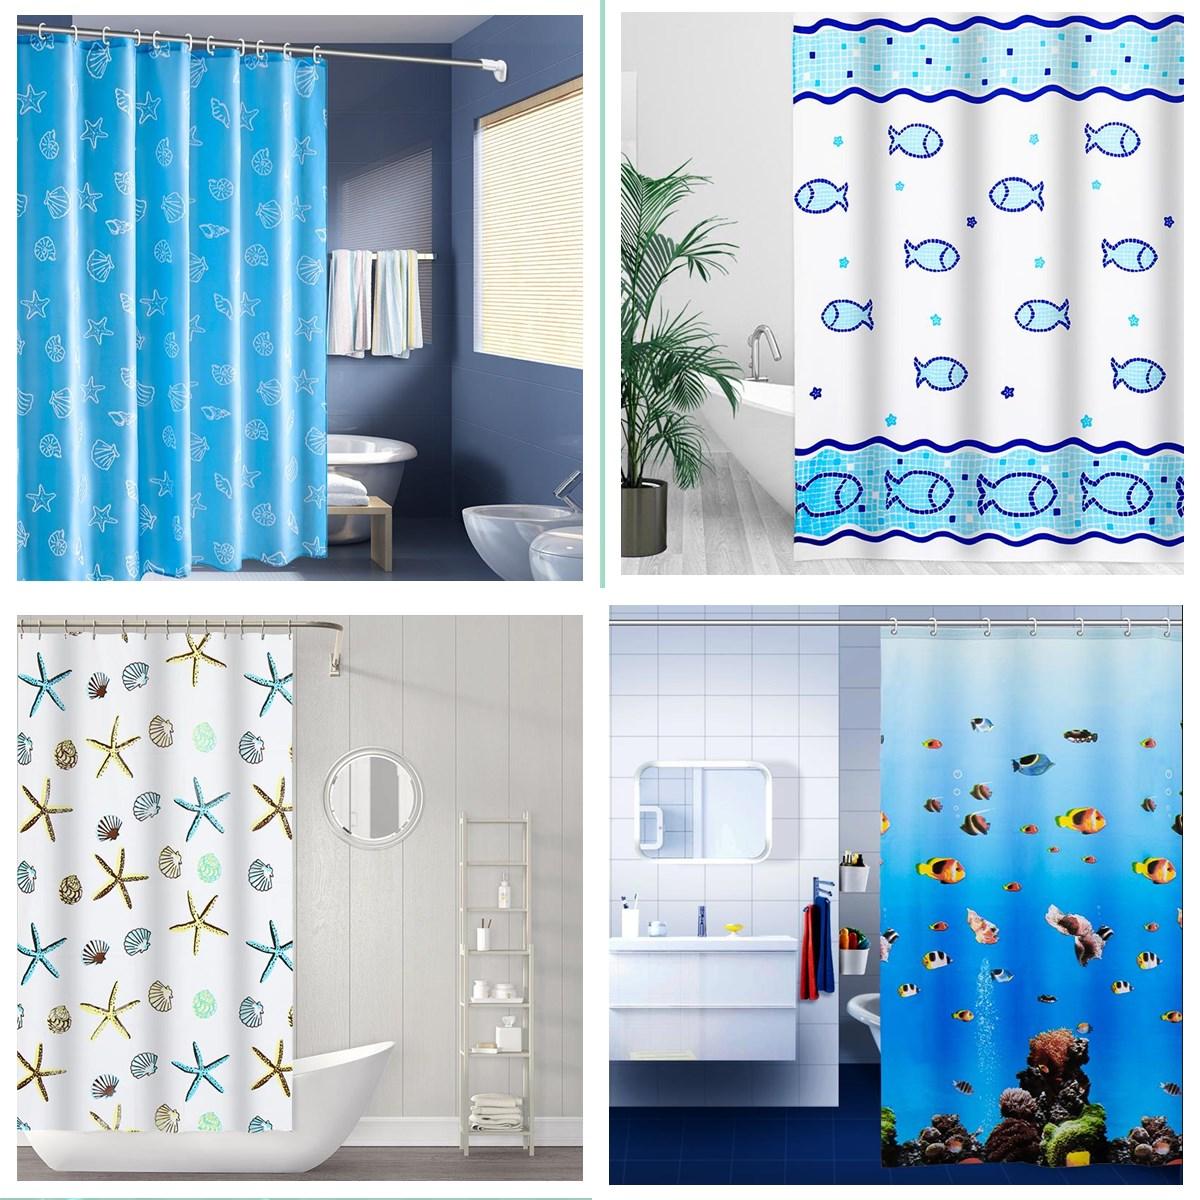 Bathroom Curved Shower Curtain Rod Shower Curtain Set Free